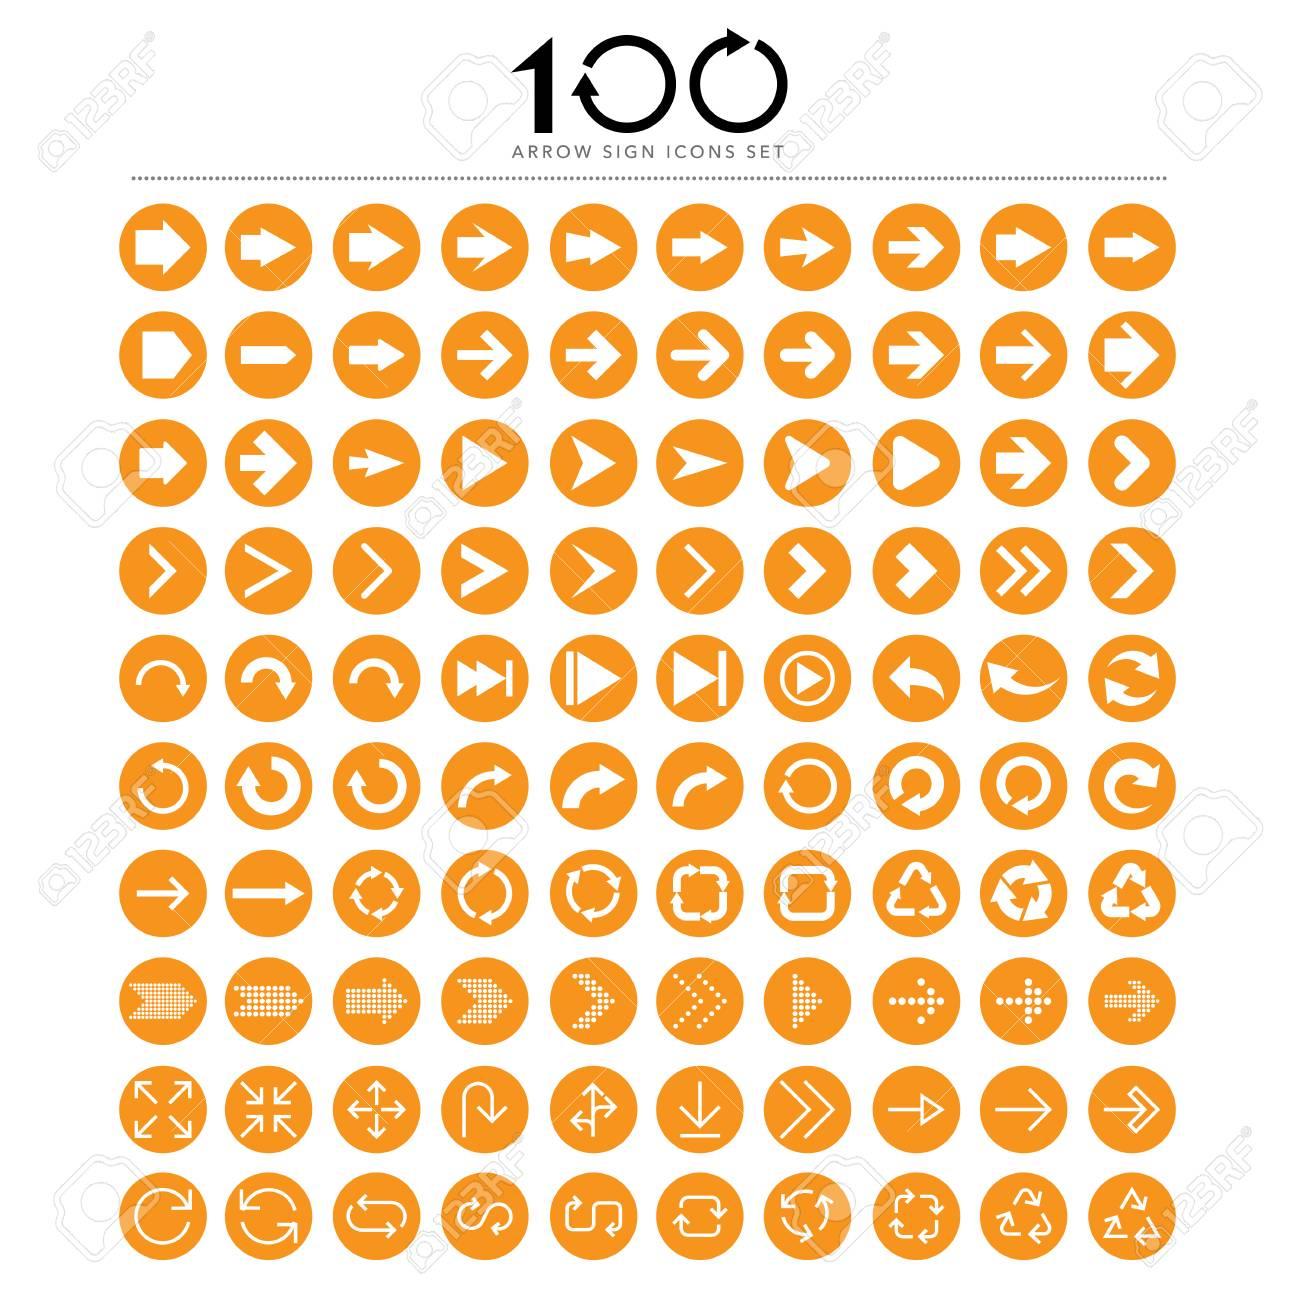 100 Basic arrow sign icons set.Illustrator. - 39327719